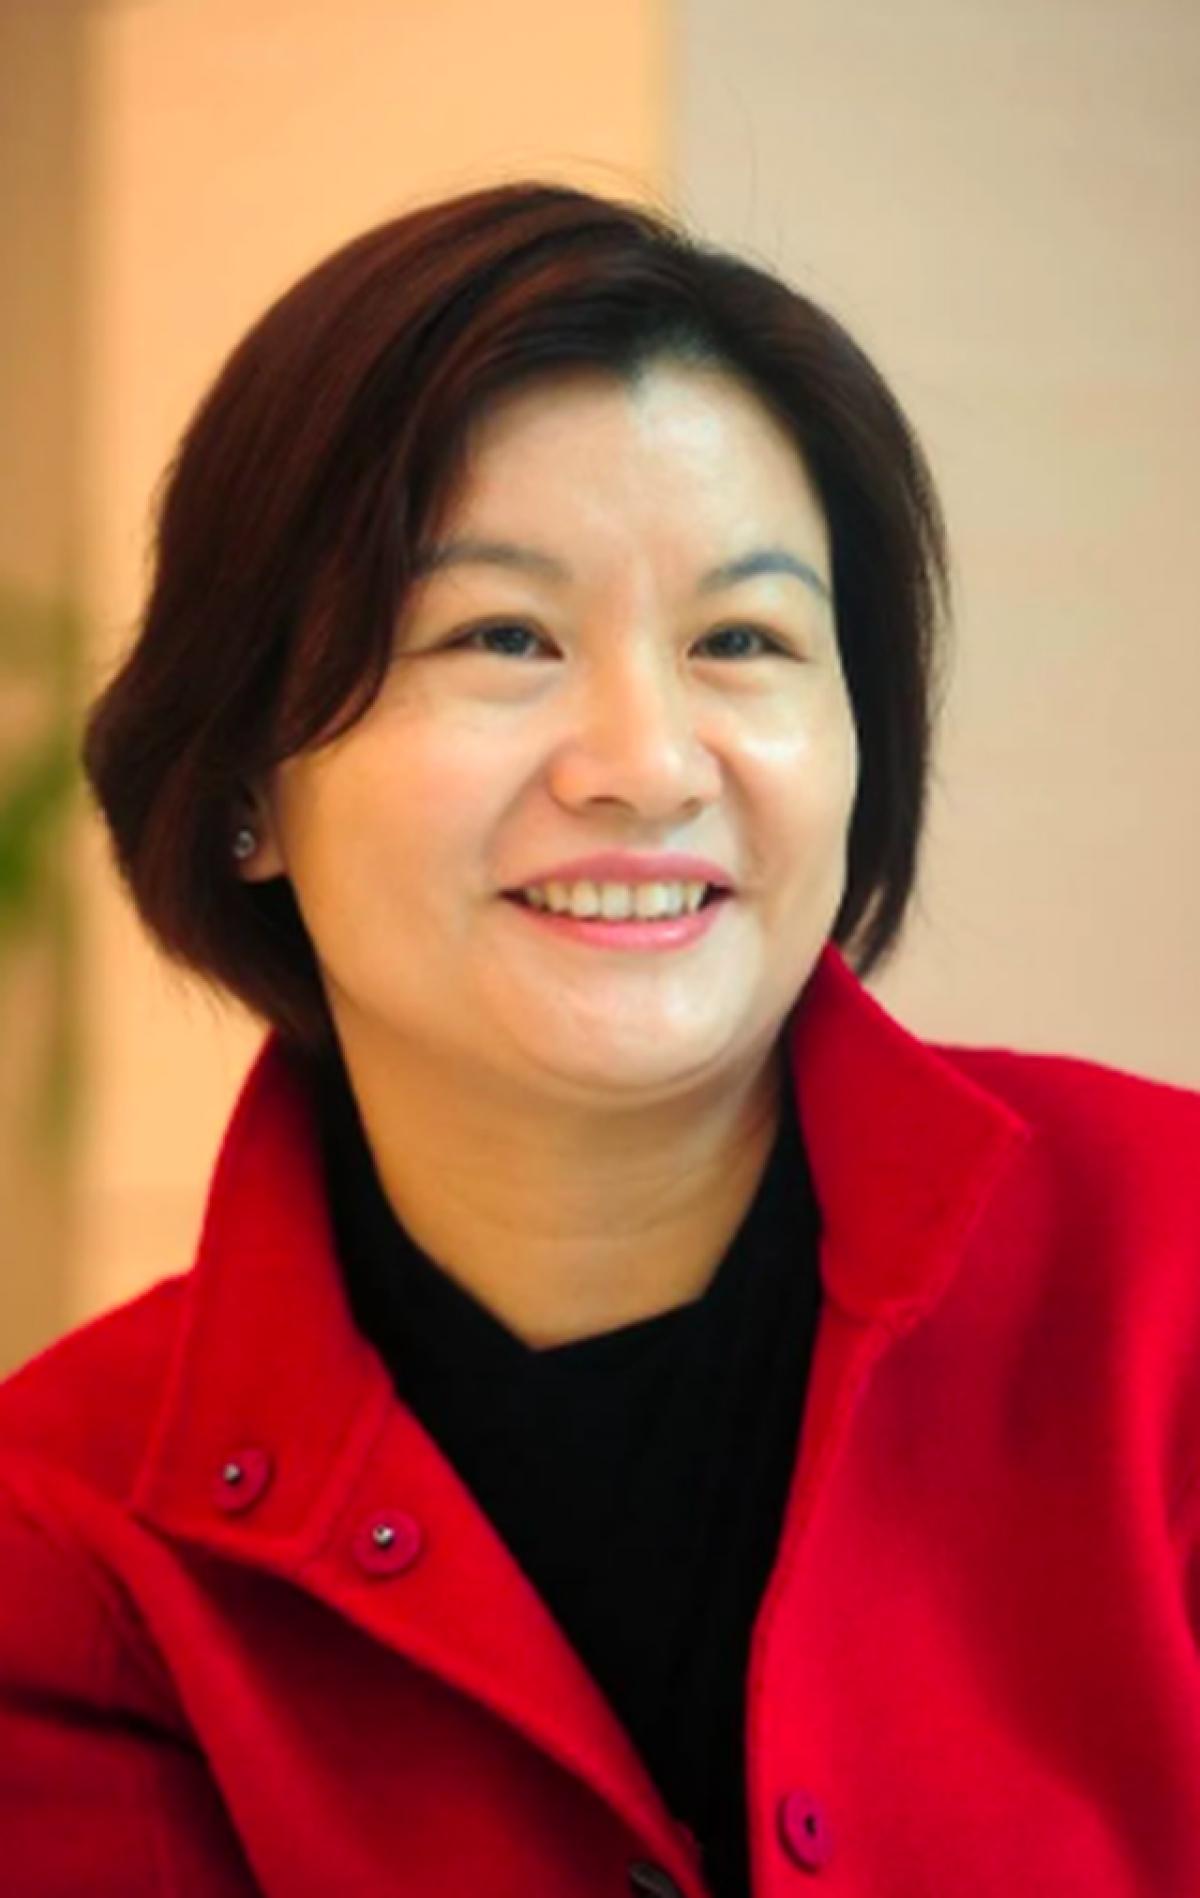 Bà Zhou Qunfei (Ảnh: AFP)